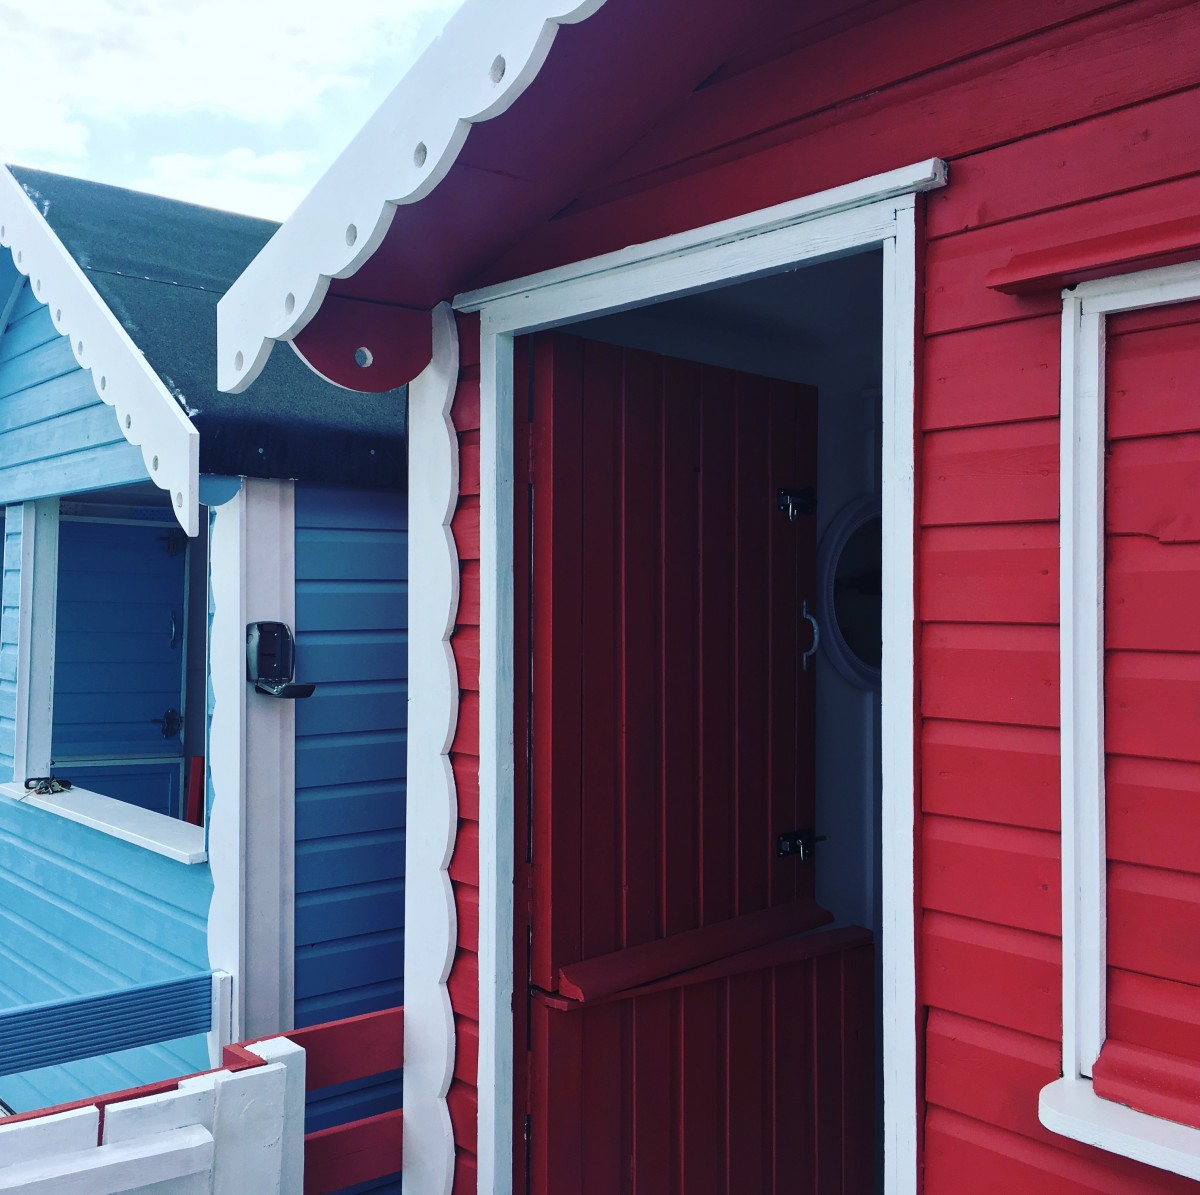 Beach Hut Decor Ideas: Mickey and Minnie Exterior Paint